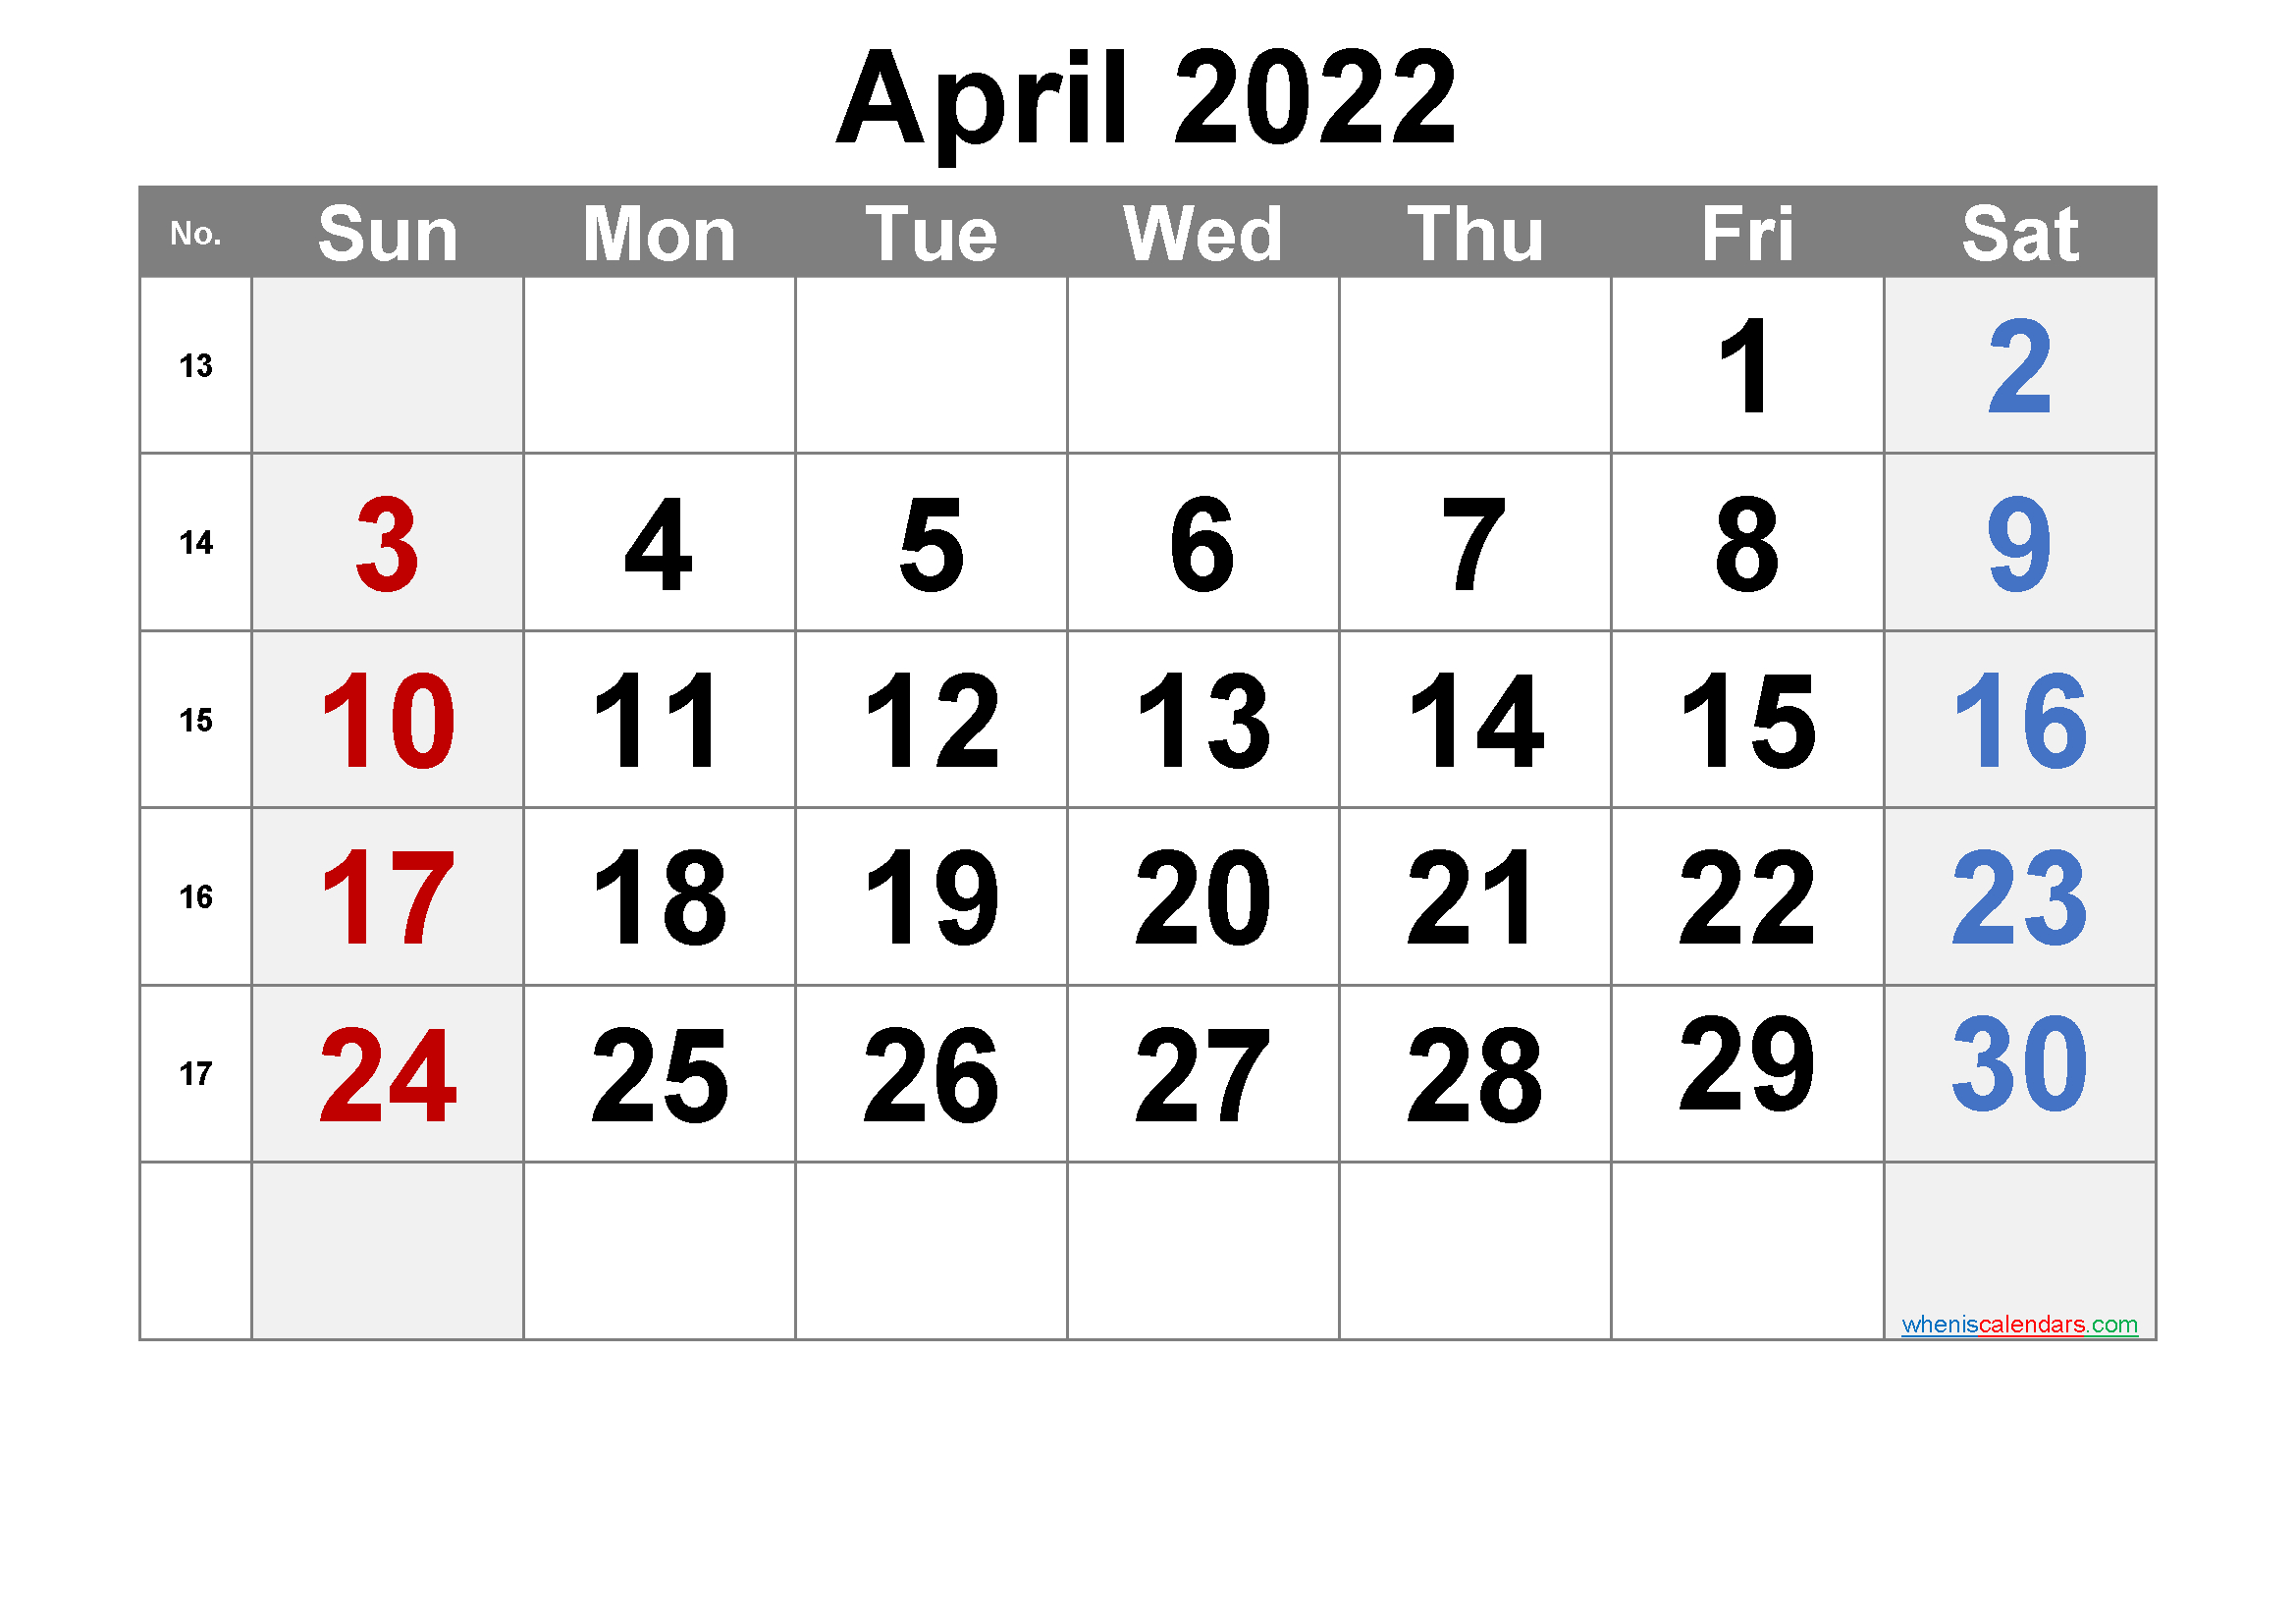 Free April 2022 Calendar With Week Numbers - Free with regard to Printable Calendar April 2022 Free Photo